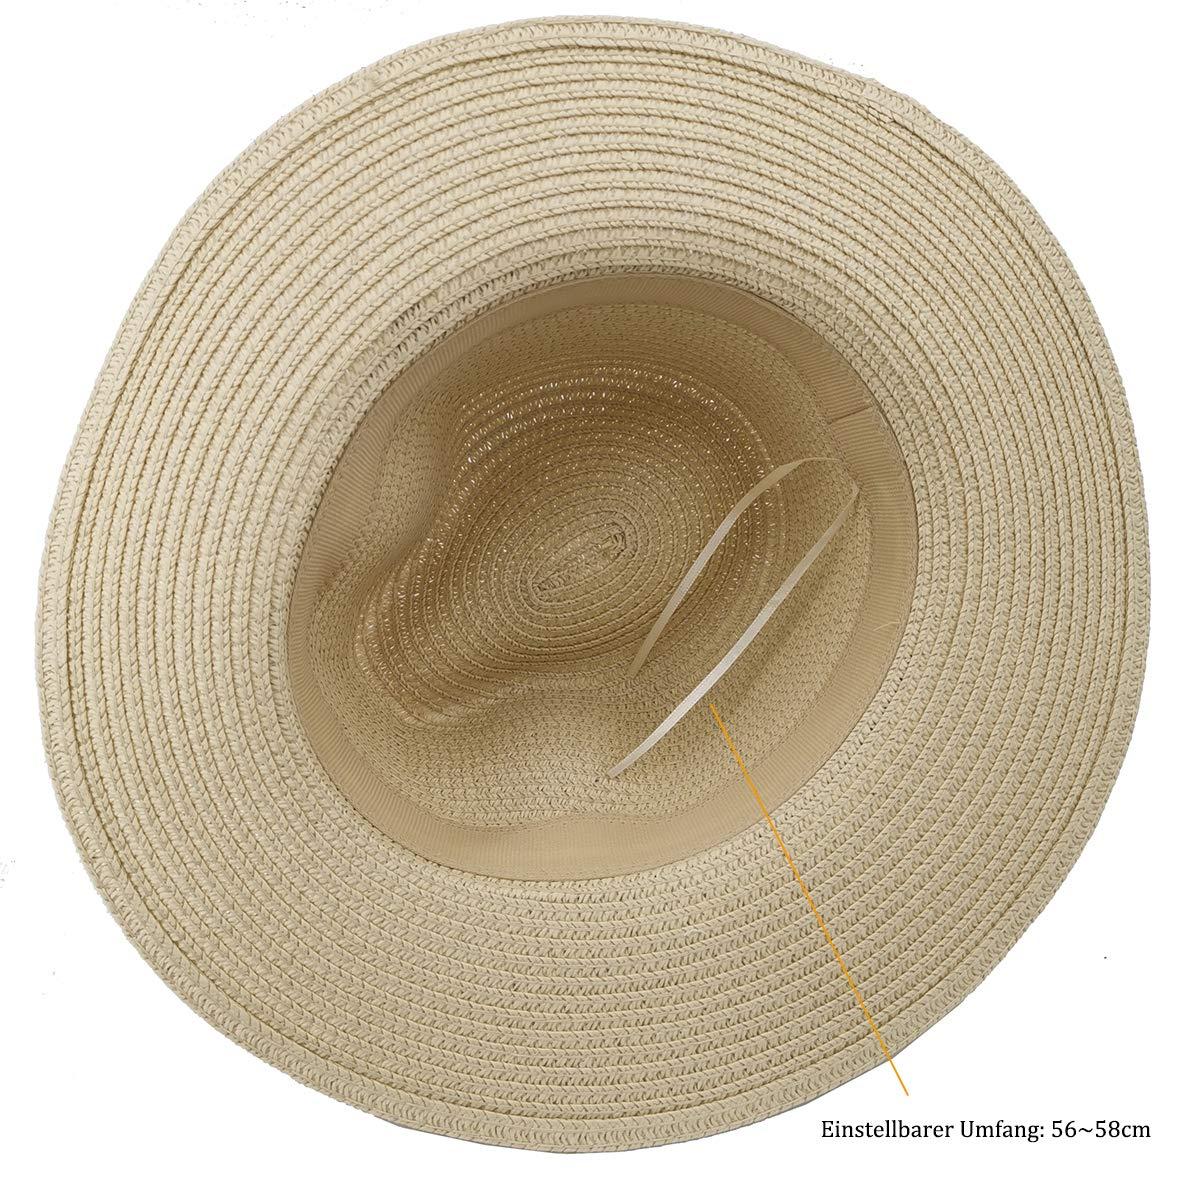 Charmylo Summer Fedora Trilby Straw Sun Hats for Women Safari Beach Hat Foldable